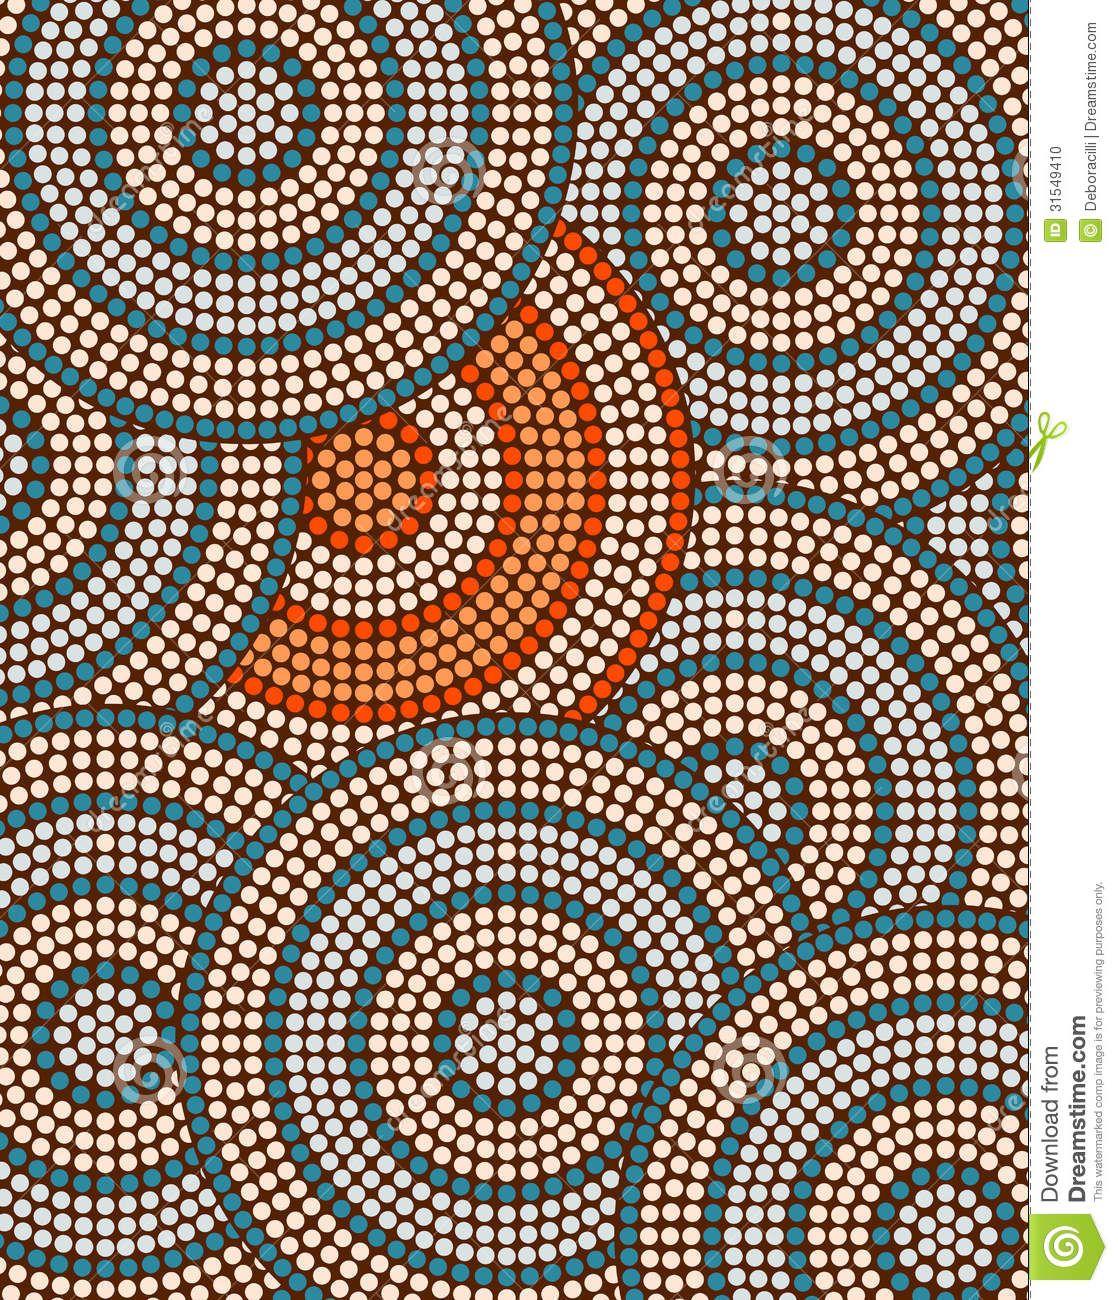 dot painting, aboriginal - Google Search